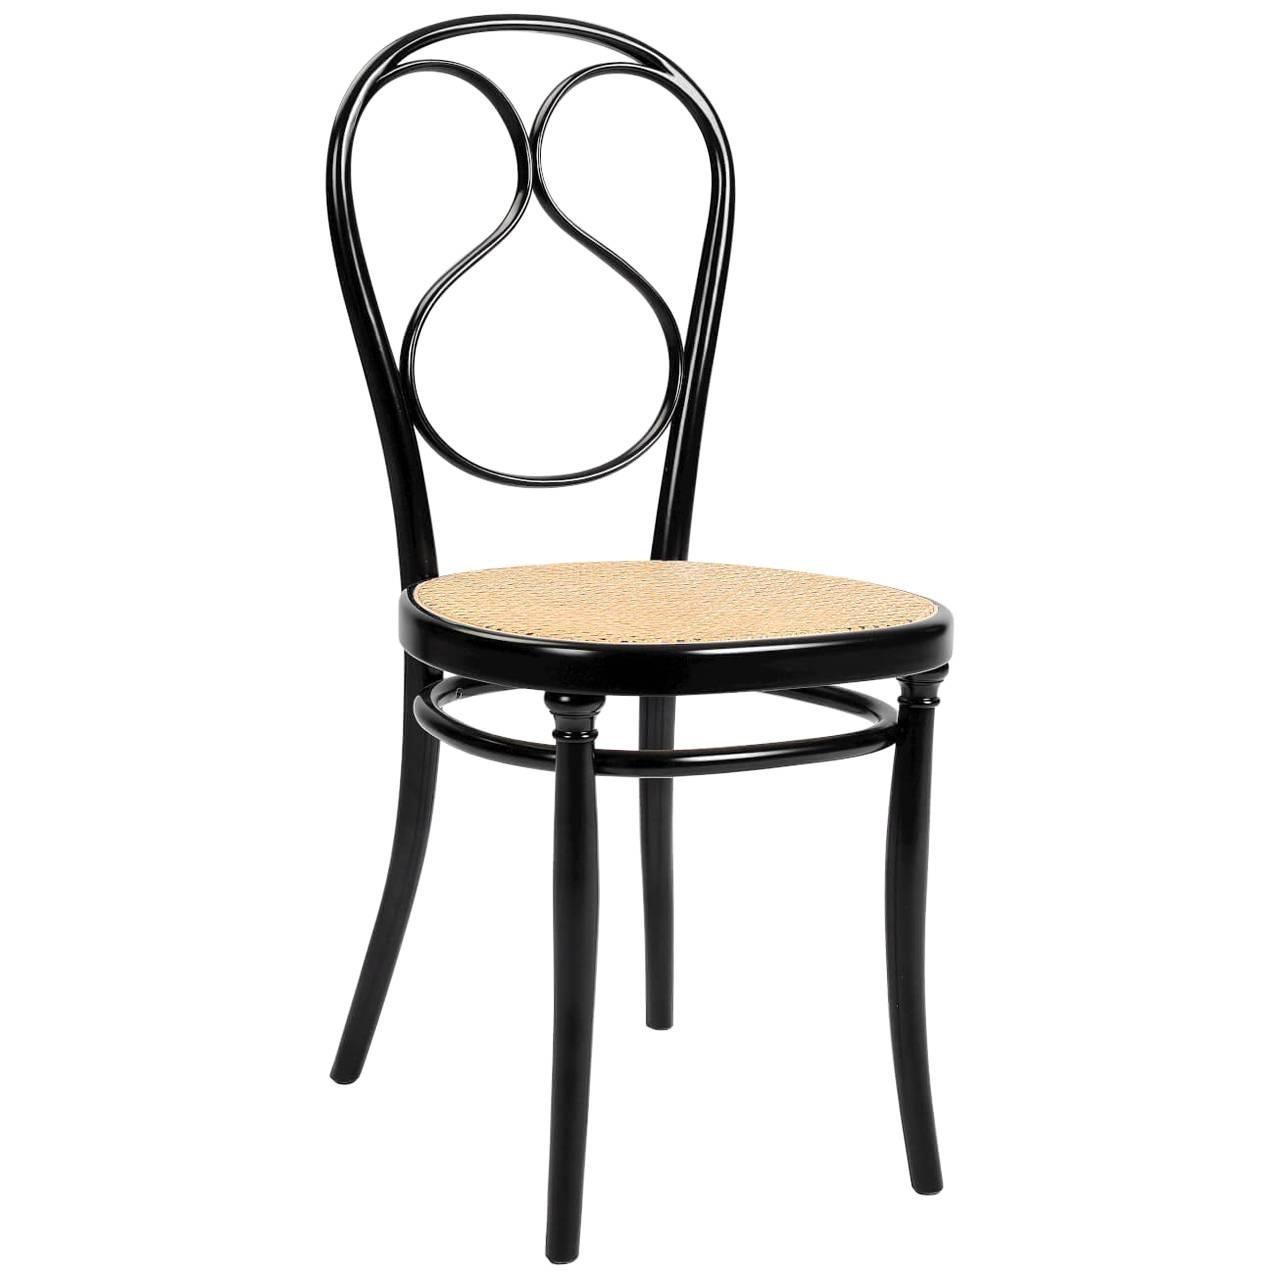 N. 1 Chair By Michael Thonet U0026 GTV